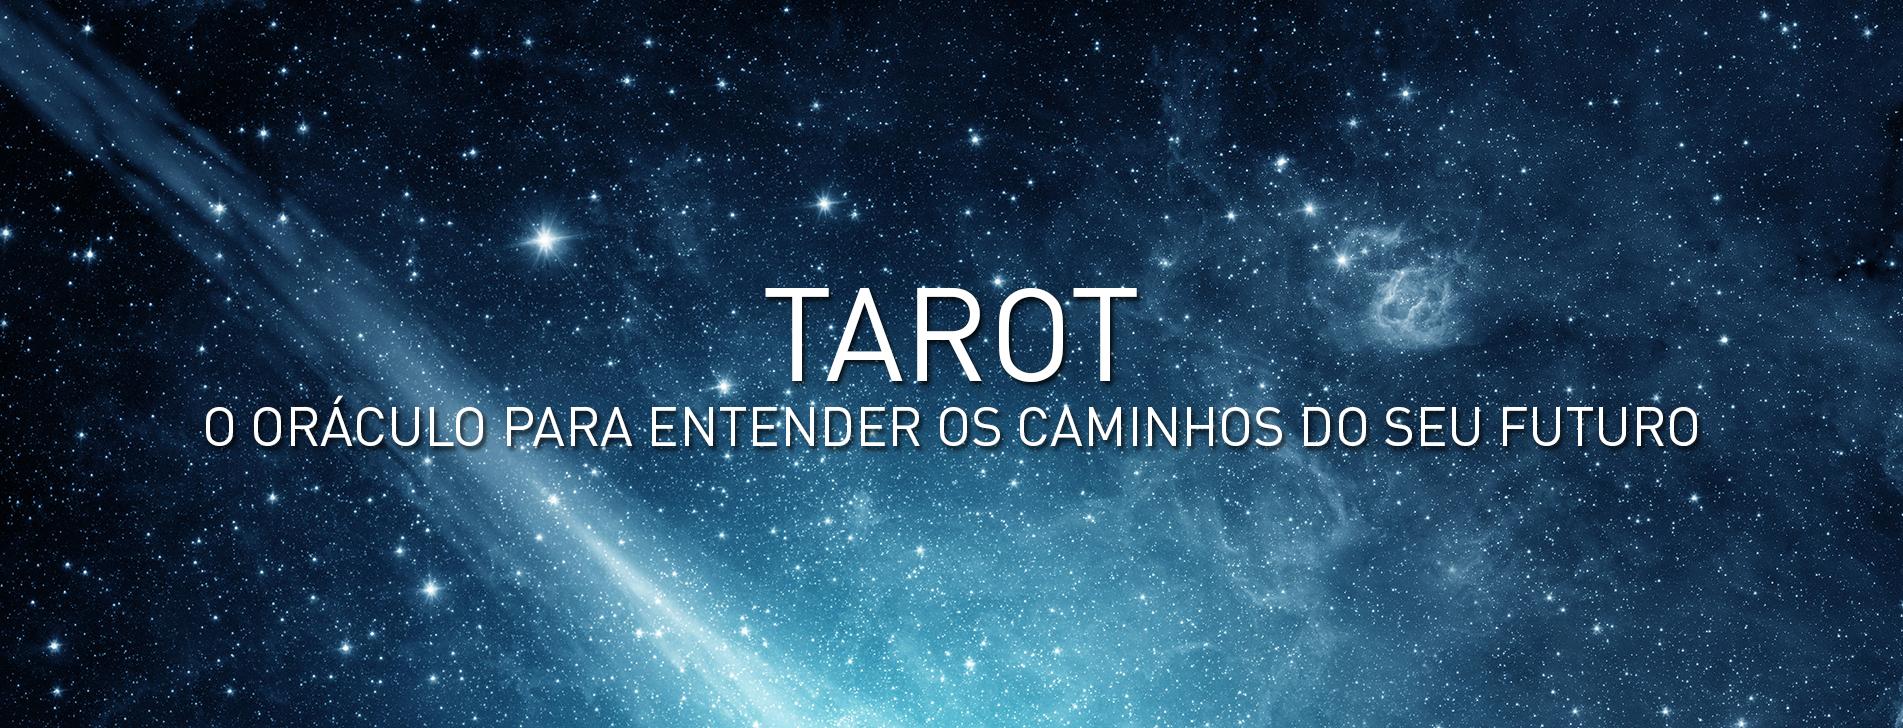 cover_tarot